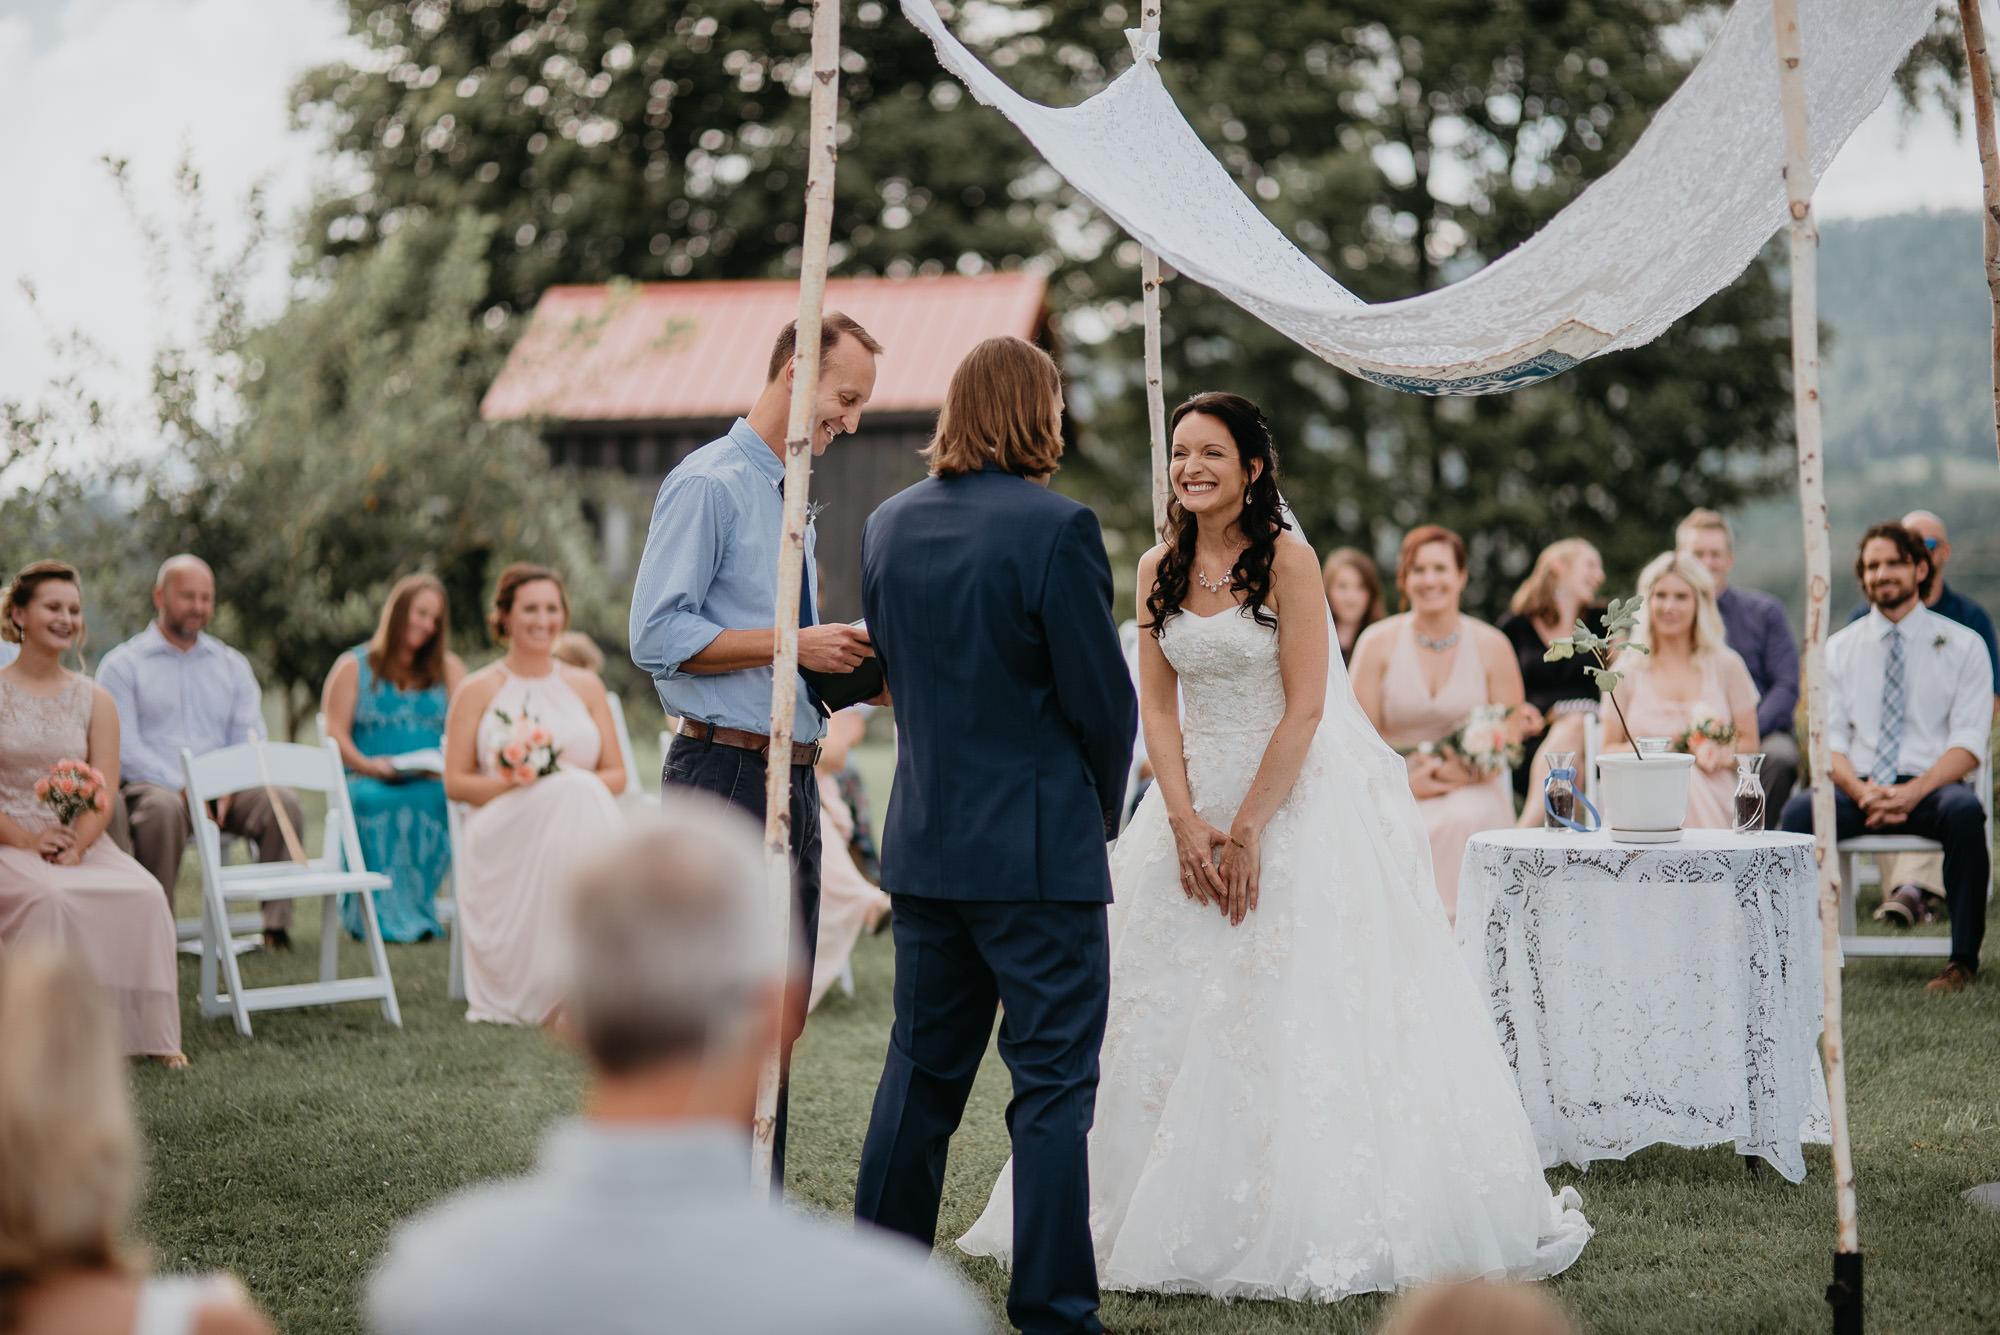 Doe Creek Farm - Weddings - Virginia - Best Wedding Photographer - Pat Cori Photography-34.jpg